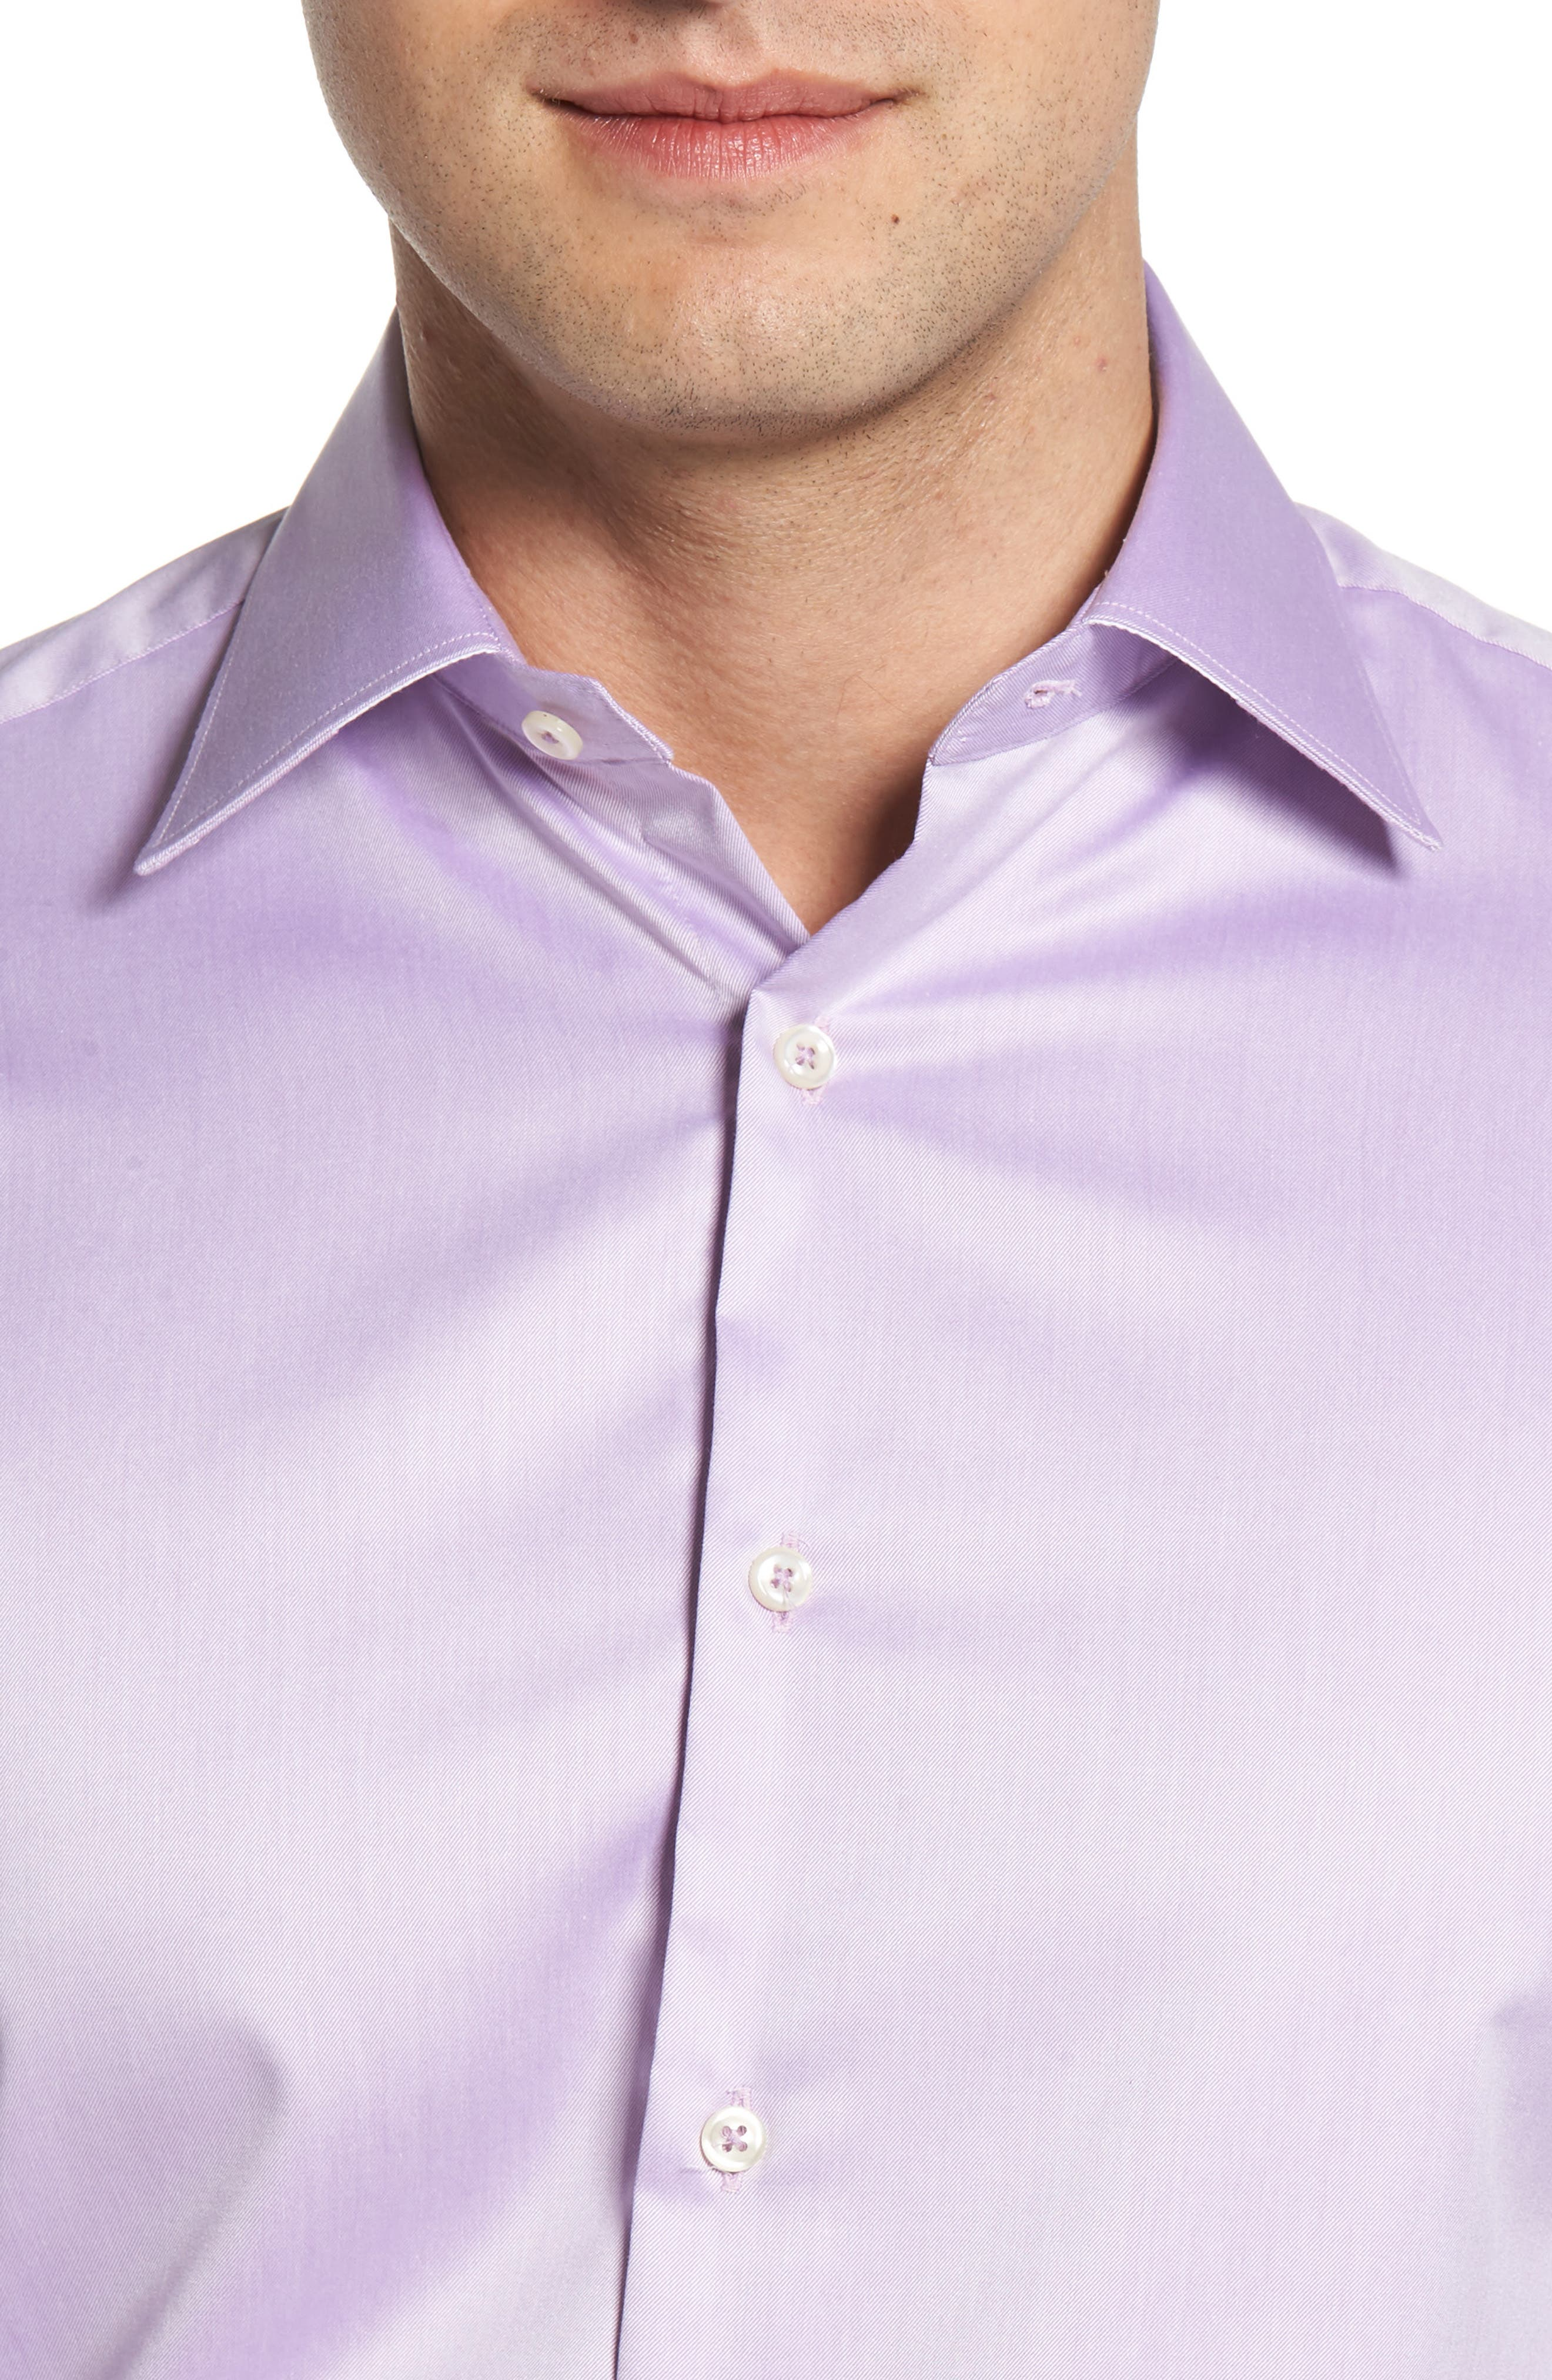 Regular Fit Solid Dress Shirt,                             Alternate thumbnail 2, color,                             PURPLE